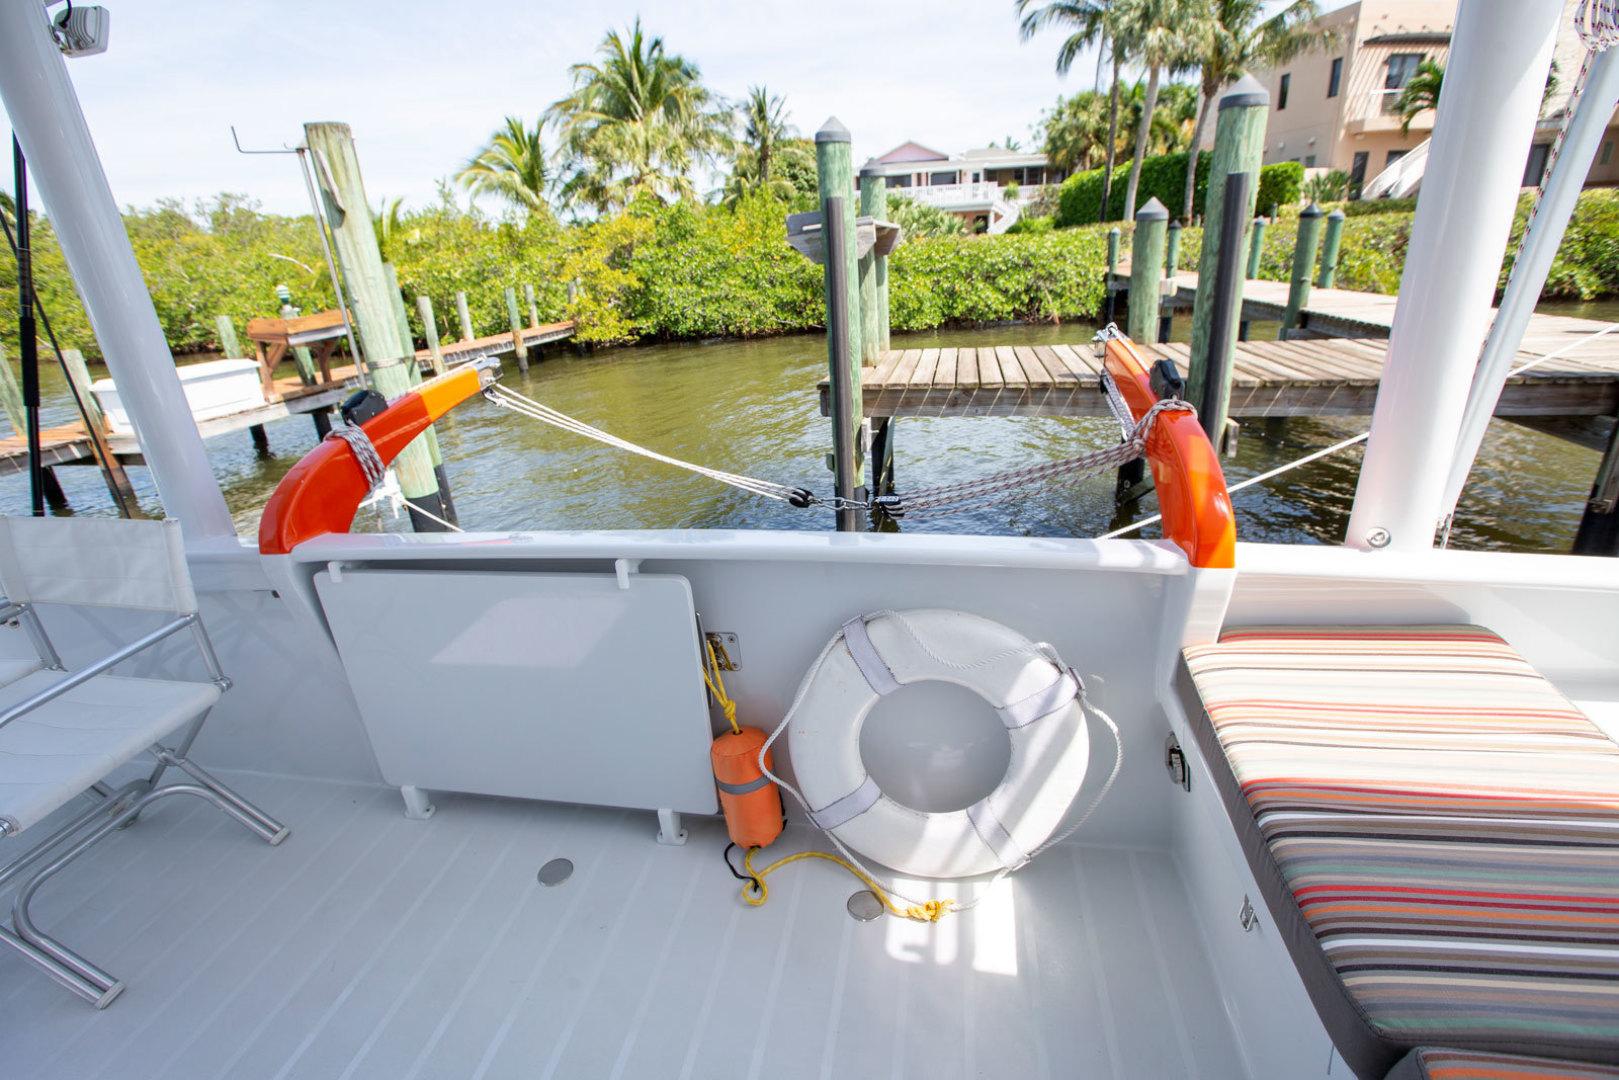 Atlantic-49 Catamaran 2018-Wabi Sabi Stuart-Florida-United States-1399248 | Thumbnail